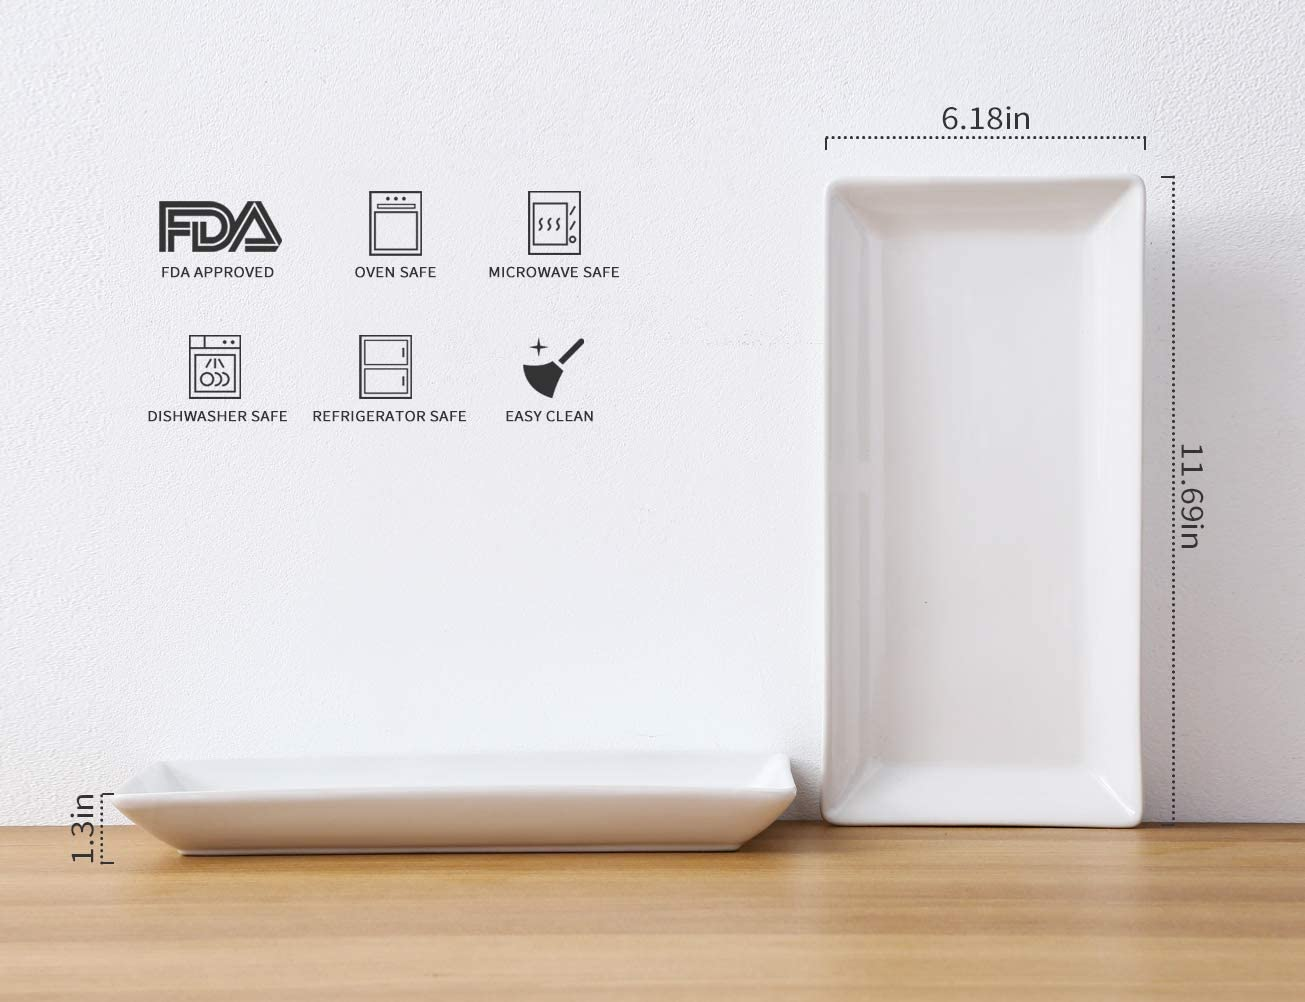 Amazon.com: Bandejas rectangulares de porcelana para fiestas ...